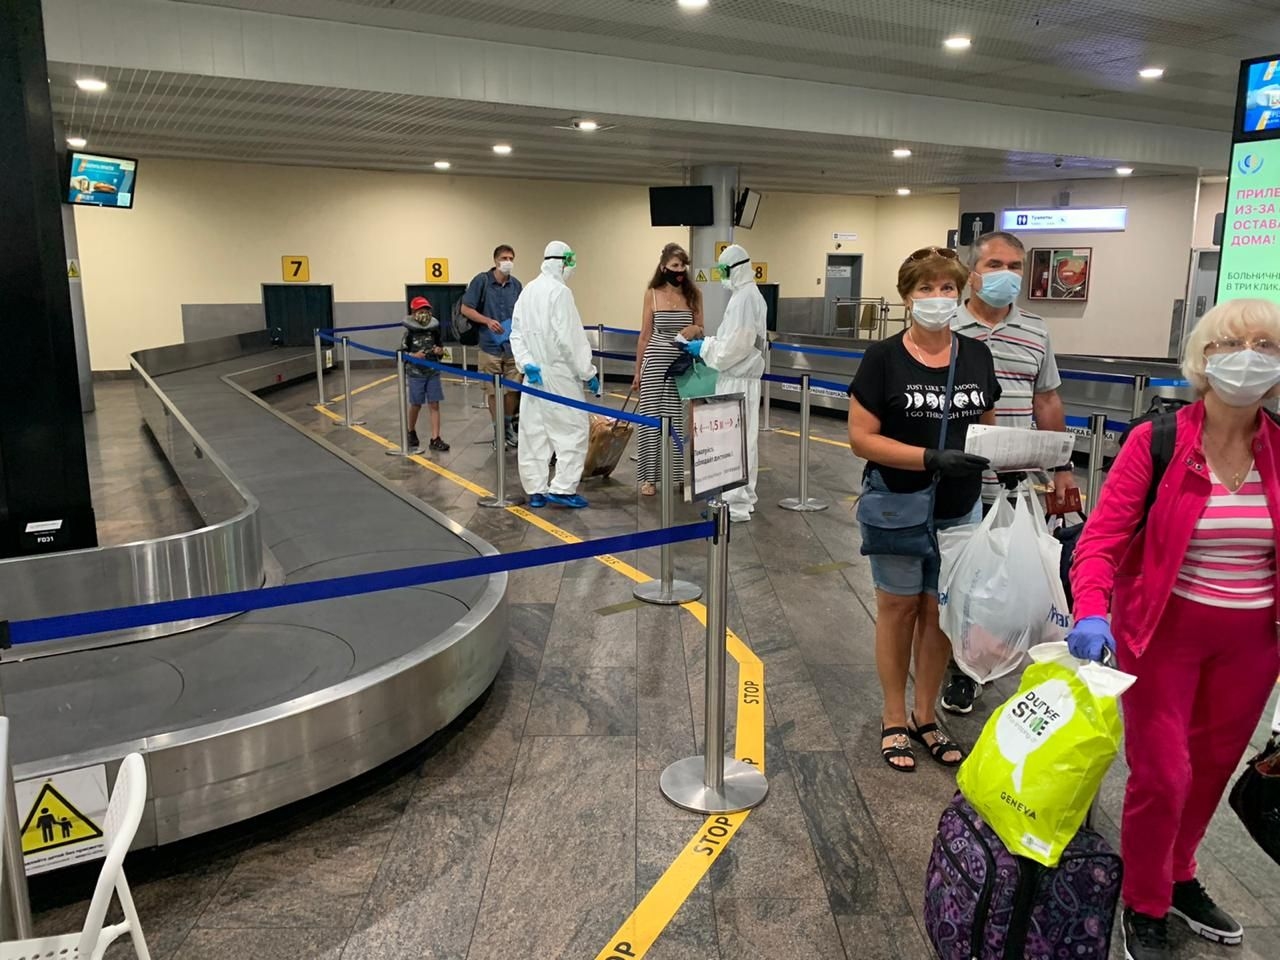 аэропорт, маска, спасатели